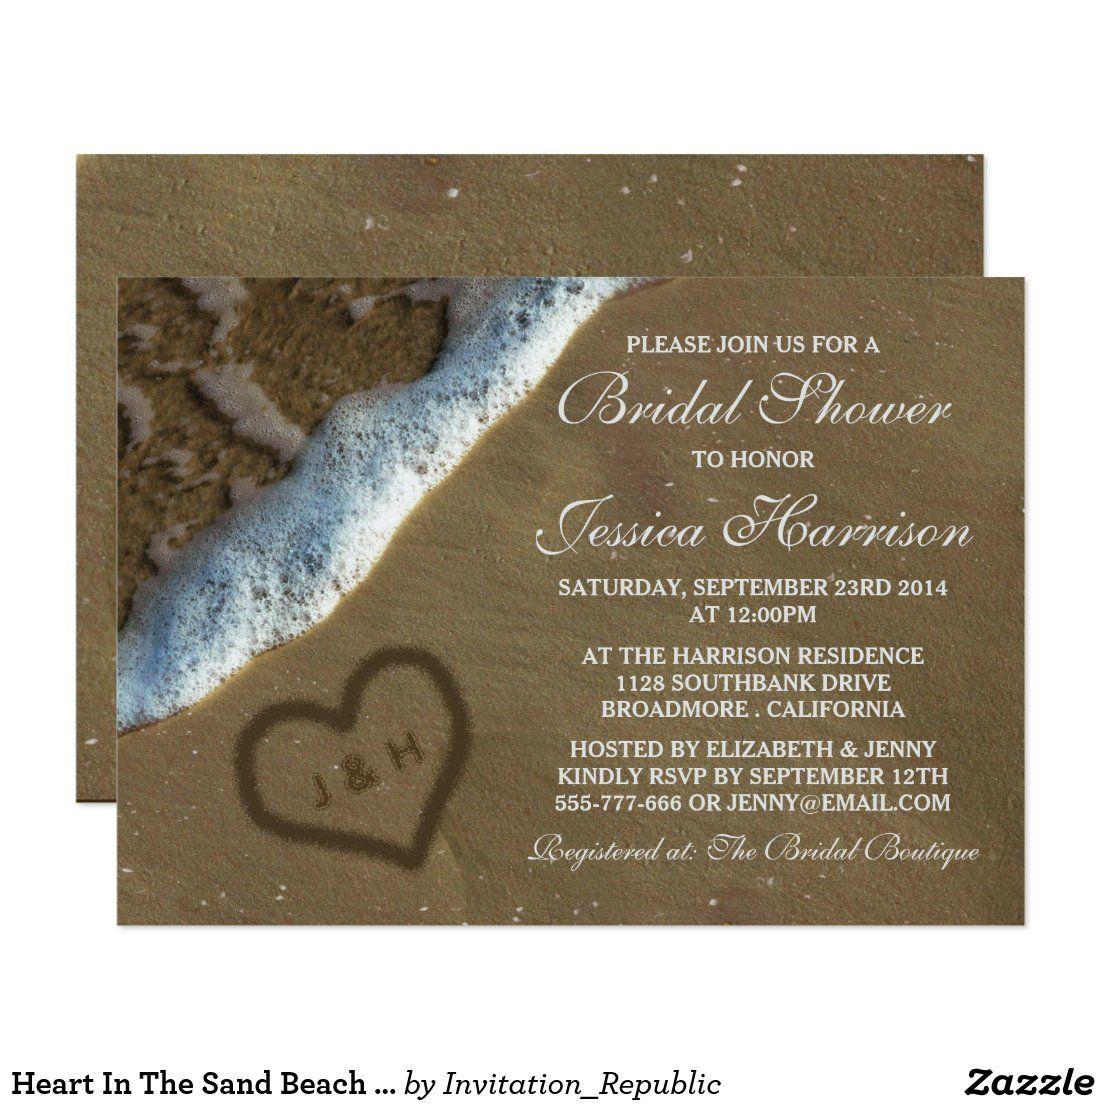 360 Ide Bridal Shower Invitations Undangan Pernikahan Cetak Undangan Pesta Blush Pink